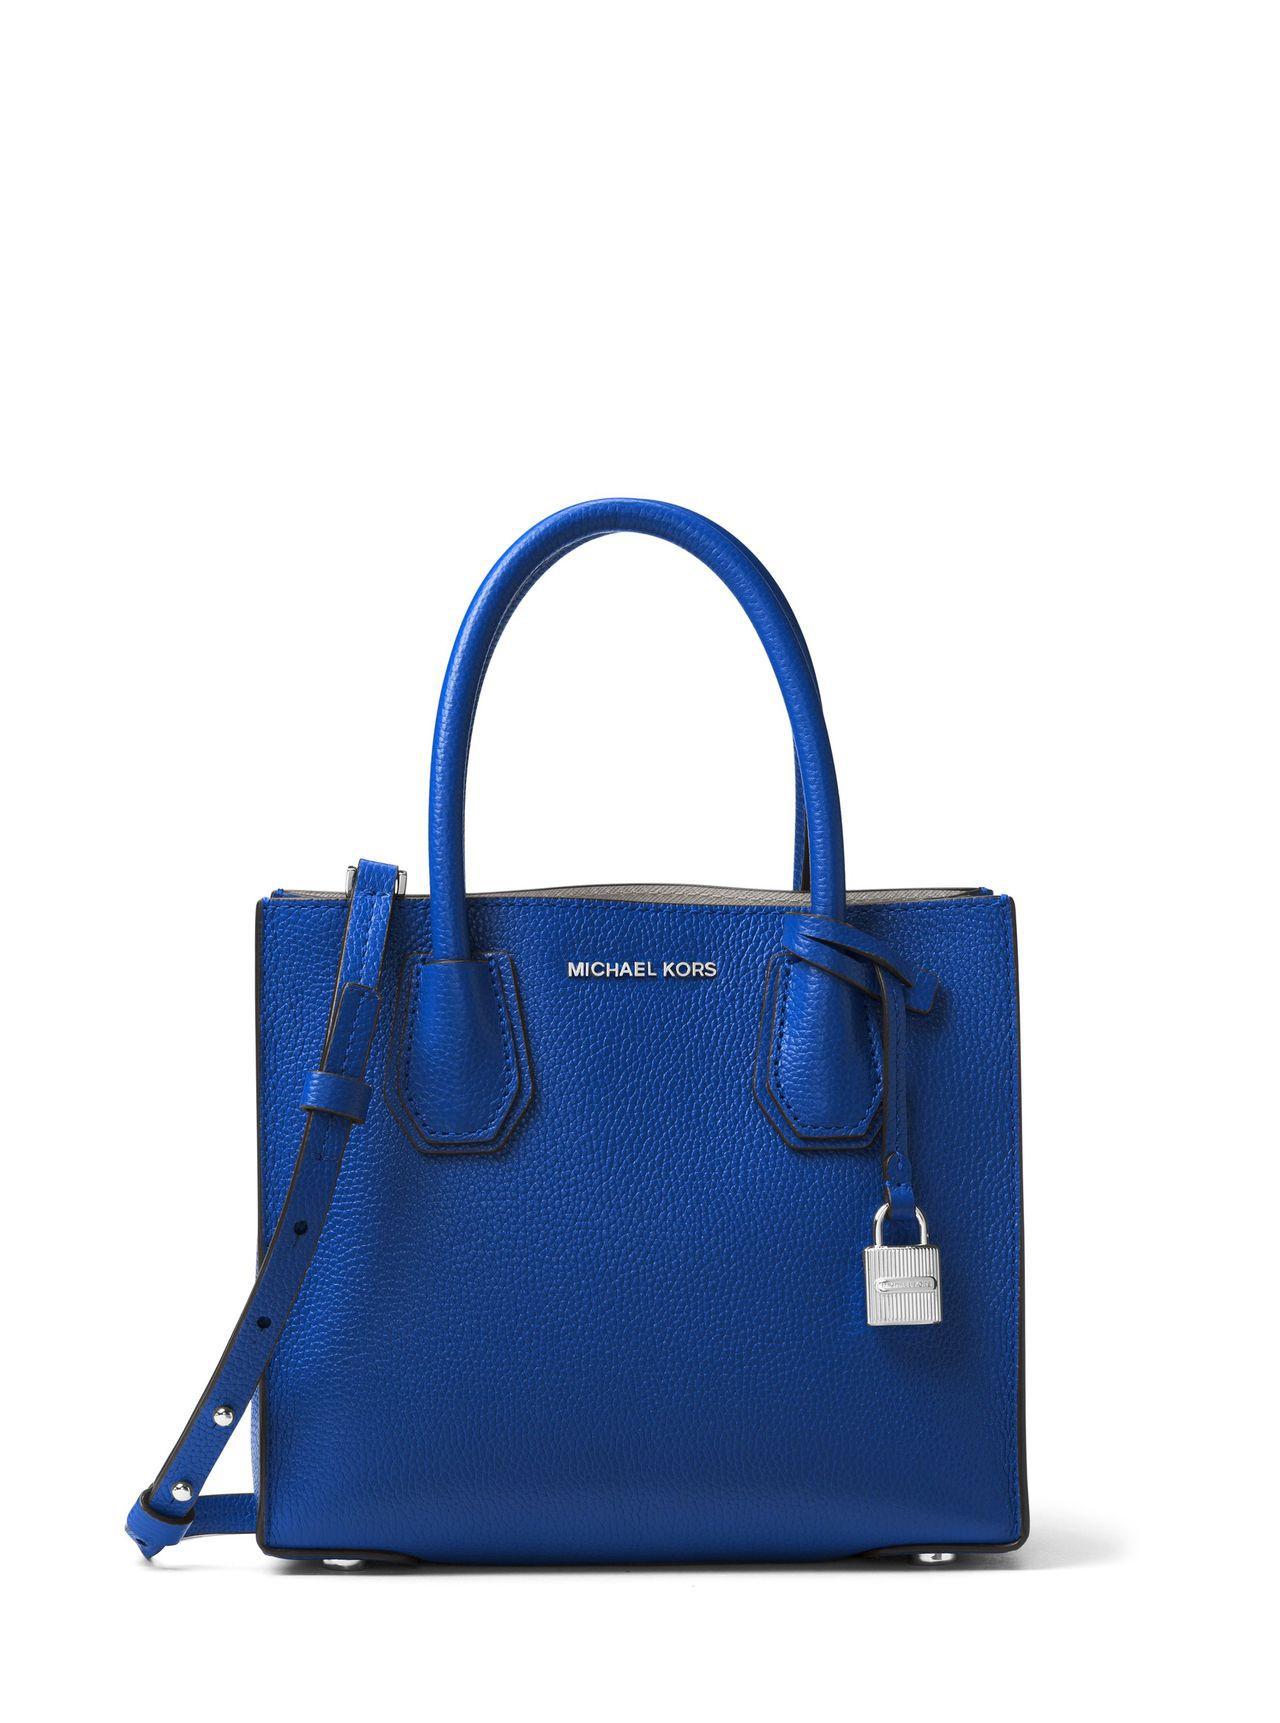 Mercer閃靛藍小方包,售價12,400元。圖/MICHAEL KORS提供